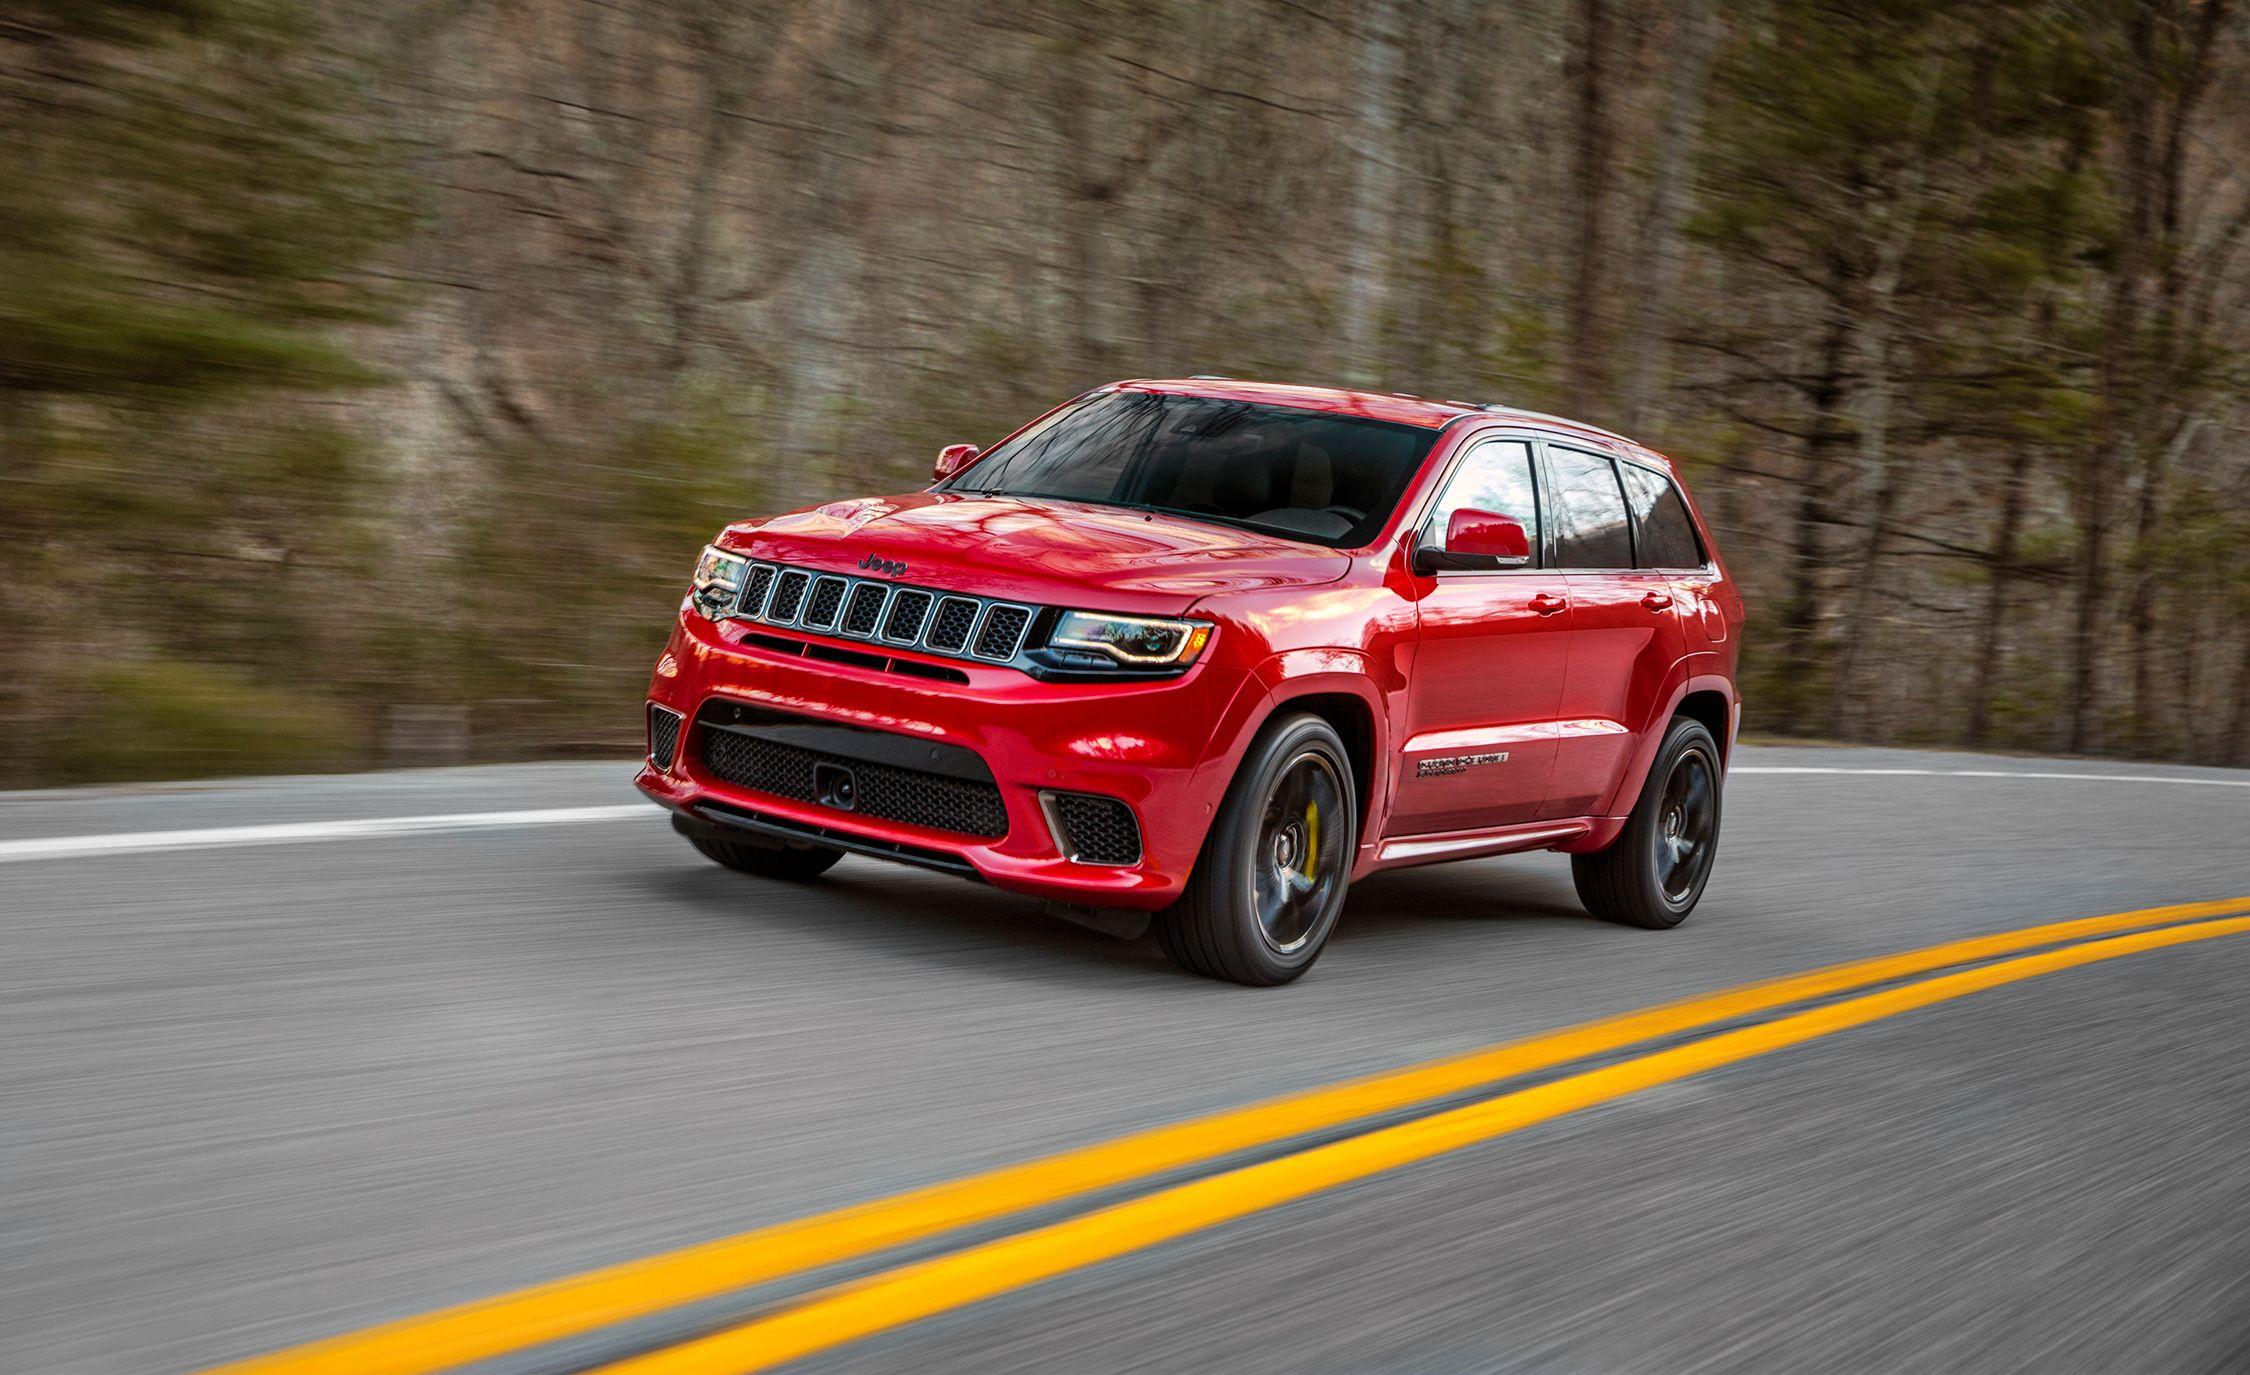 2018 Jeep Grand Cherokee Trackhawk: The Worldu0027s Most Powerful SUV